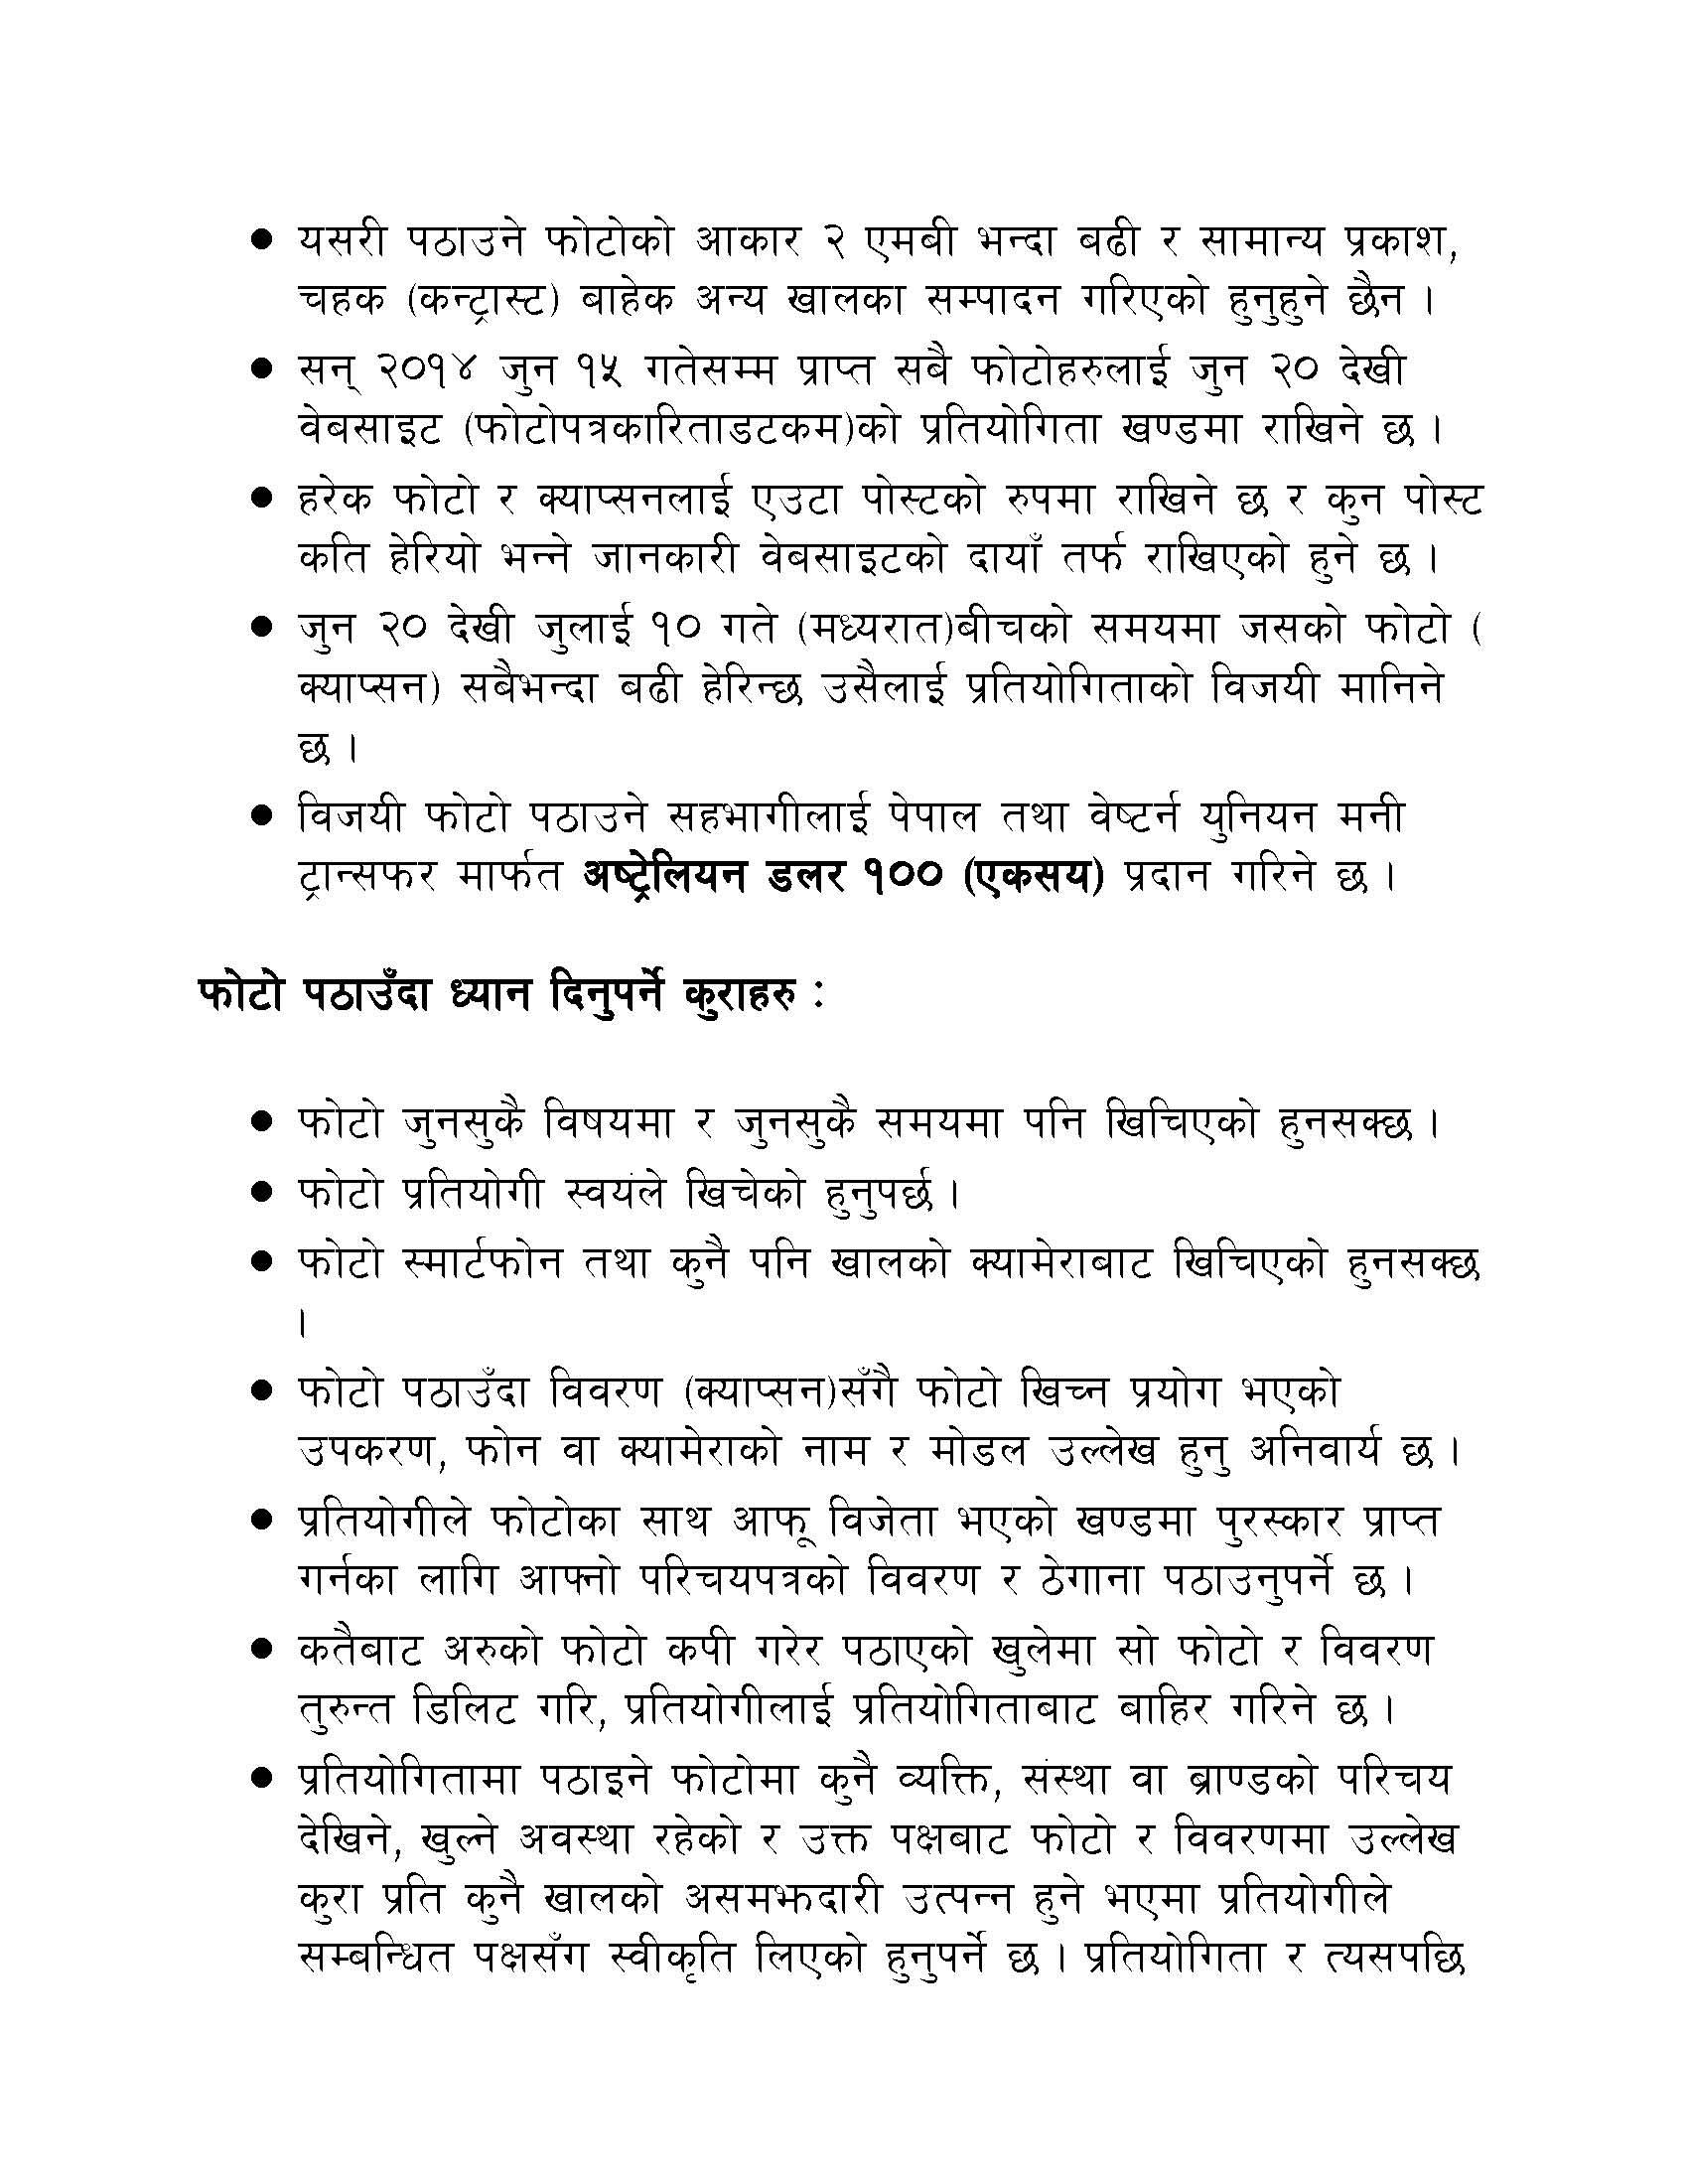 02Photopatrakarita World Nepalese Online Photo Competition